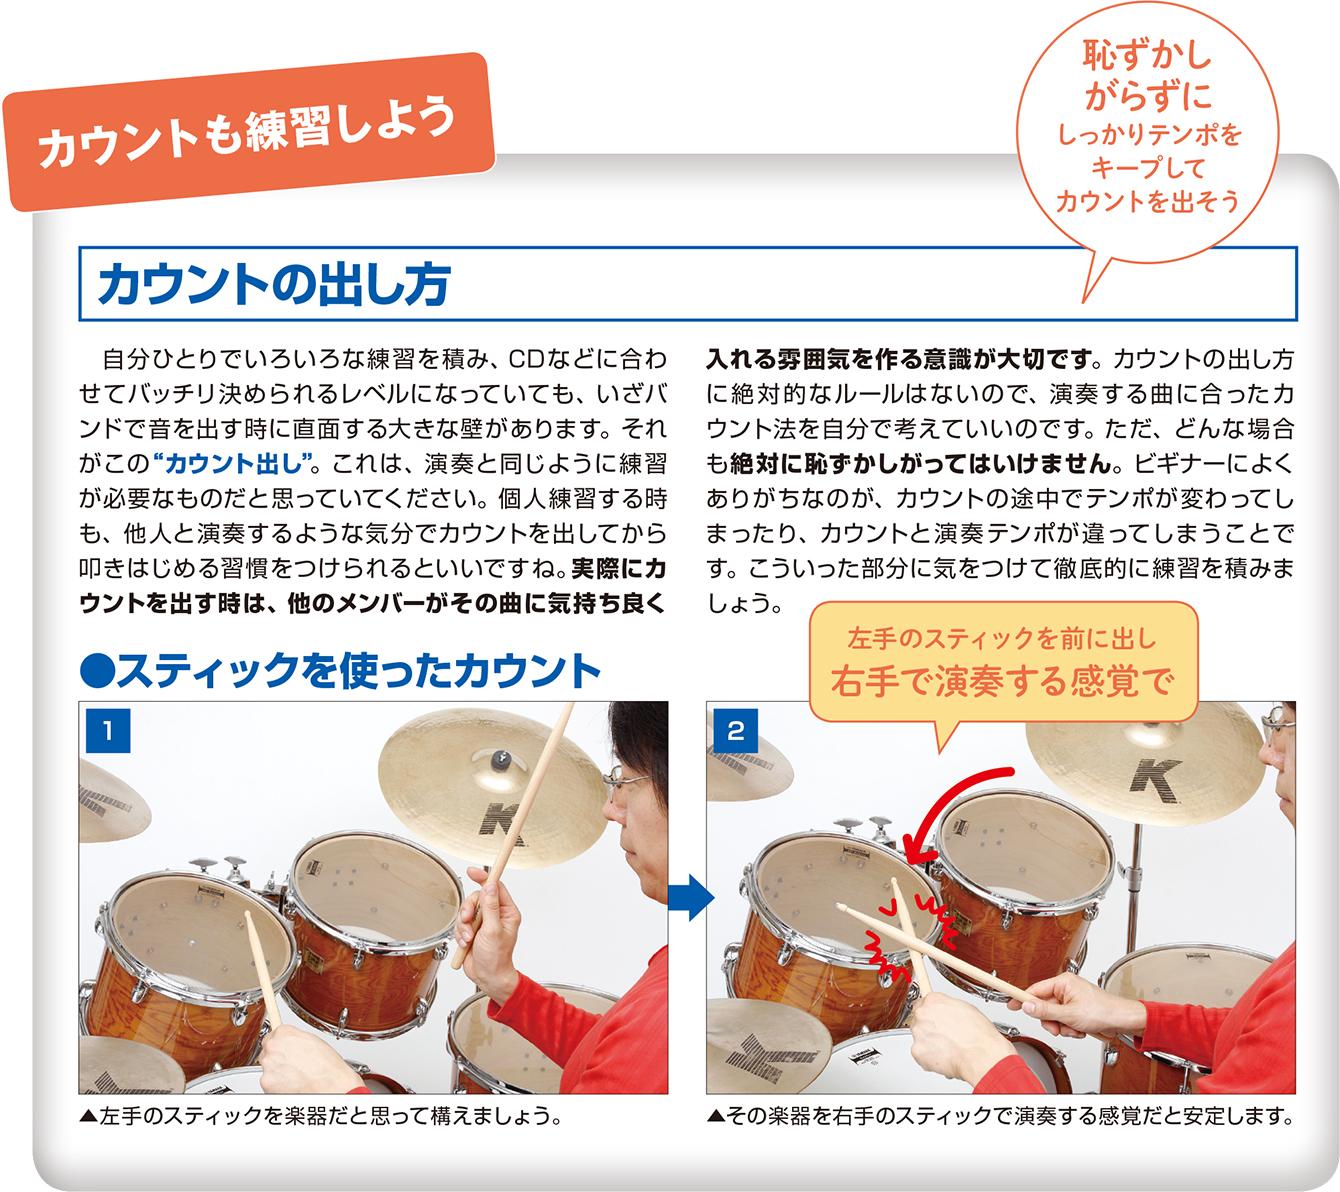 keion_v3_drum_01.jpg